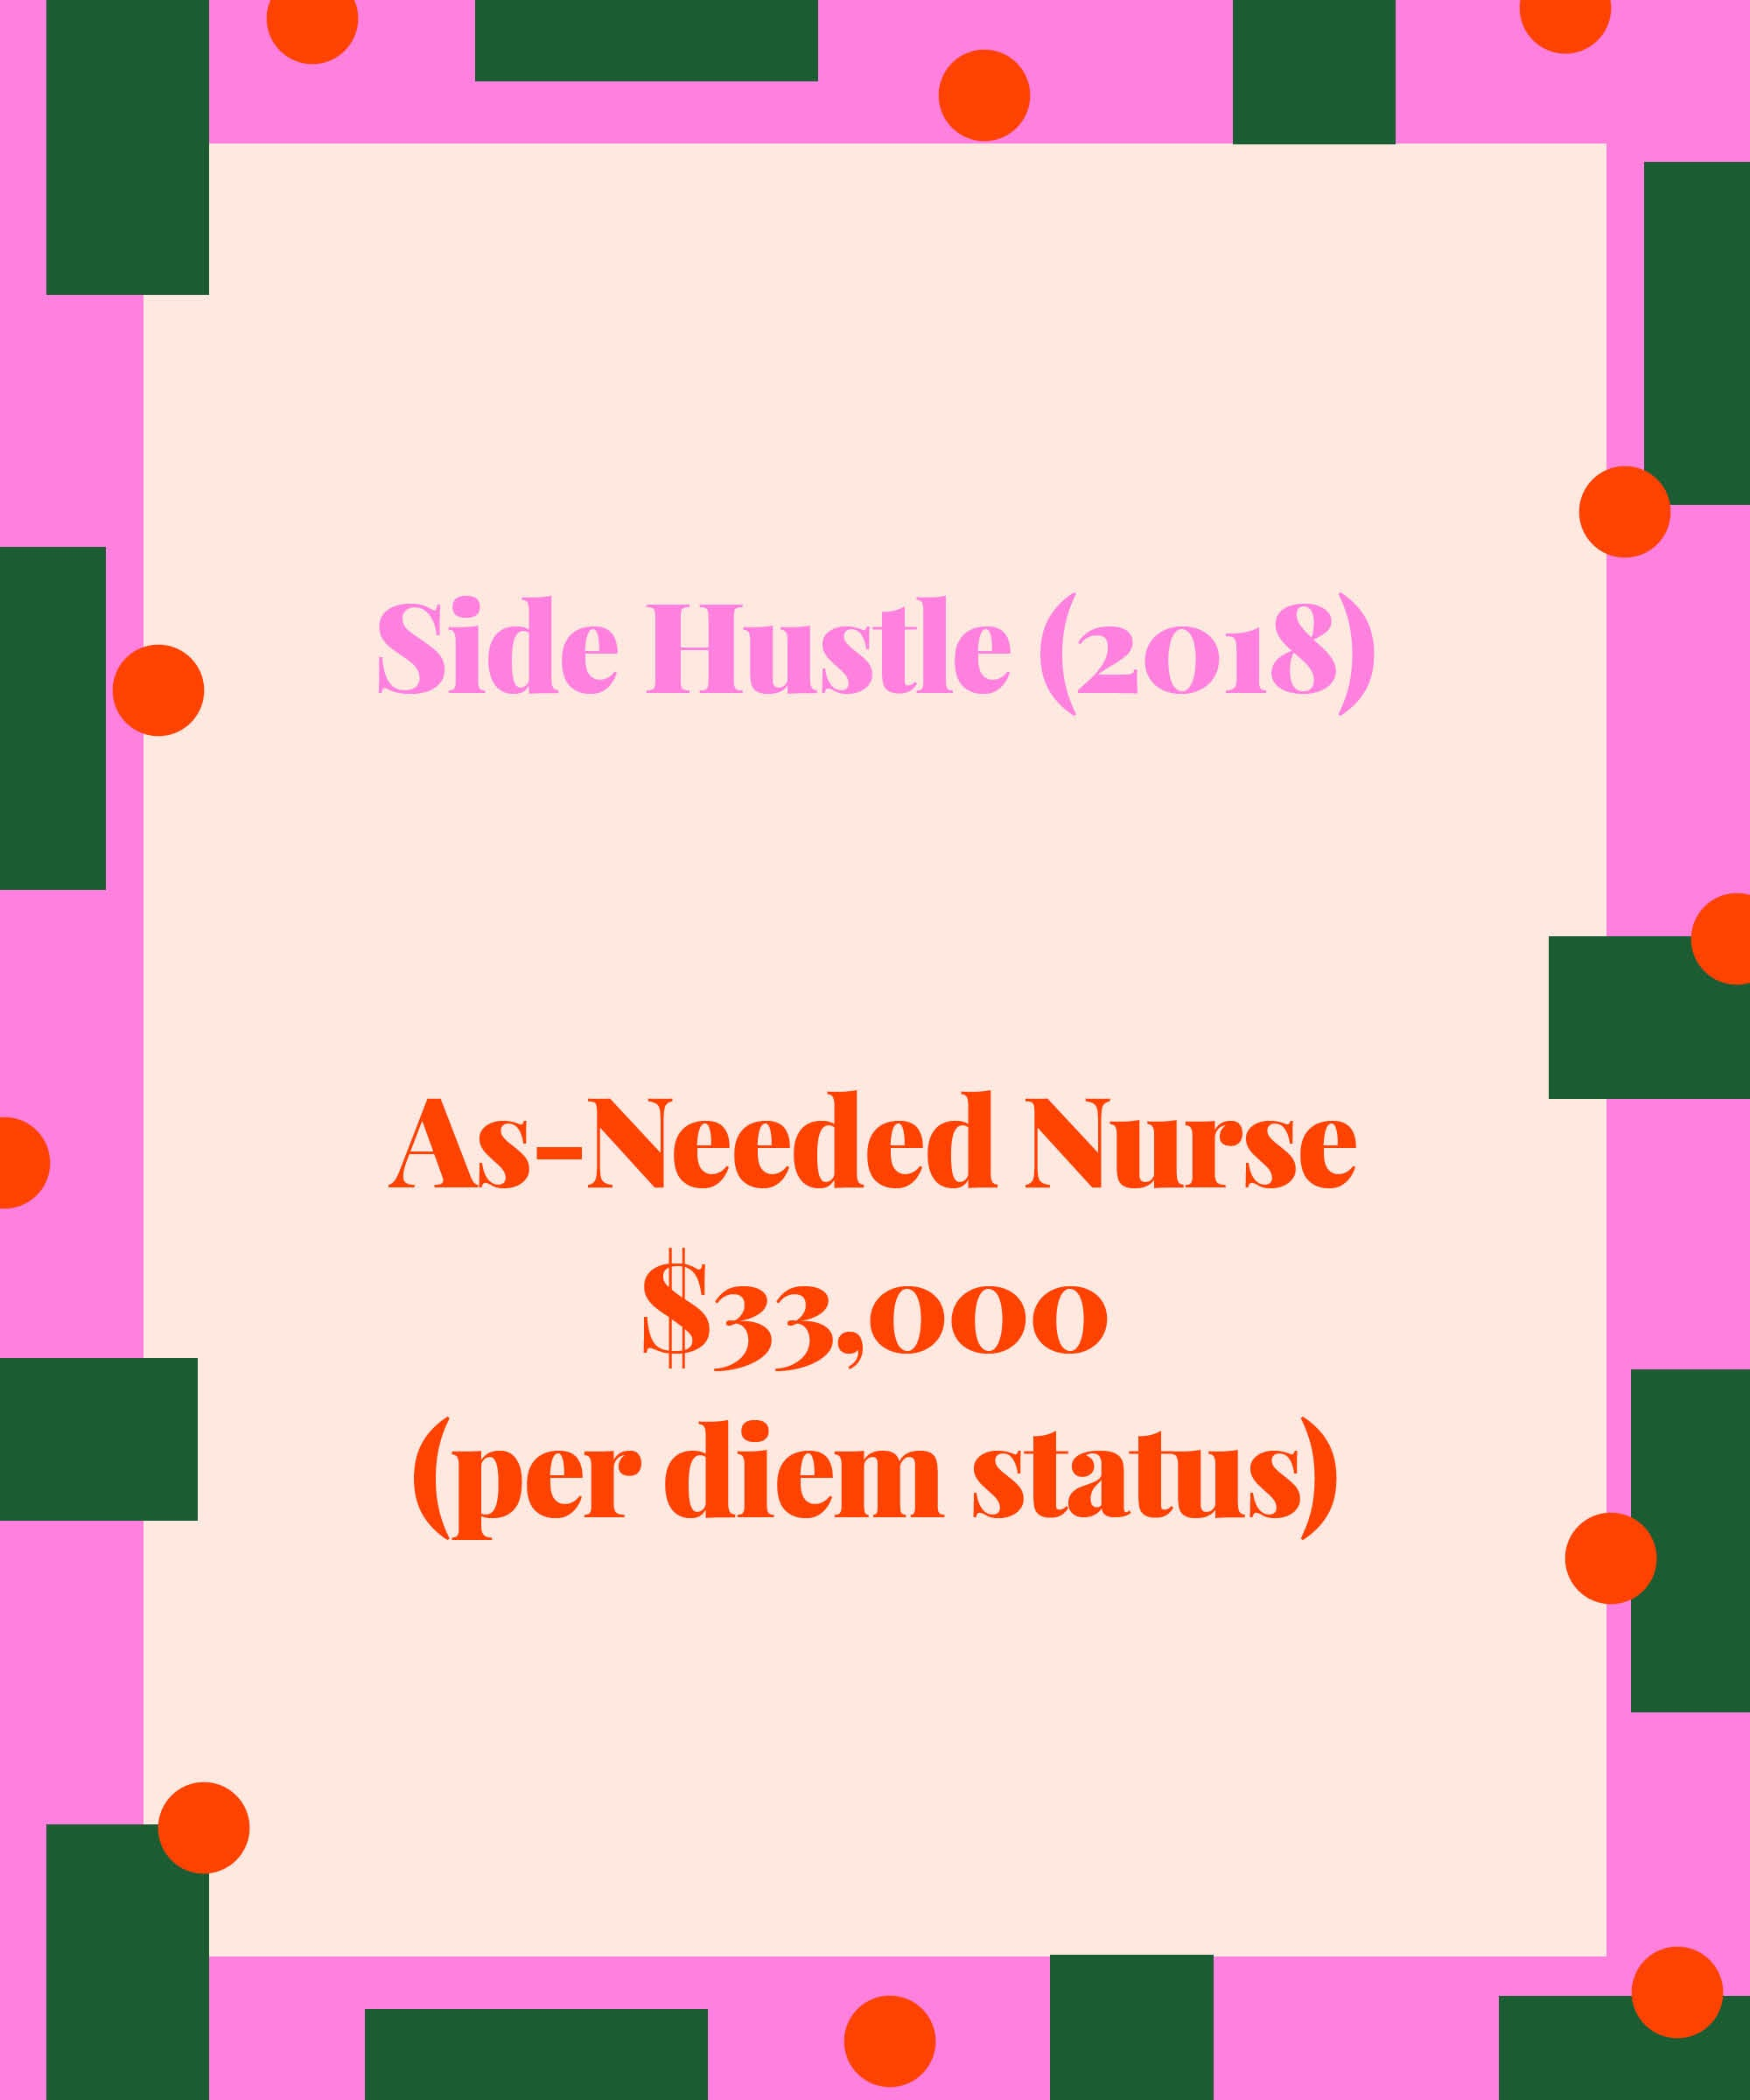 Nurse sex for hustle photo 726